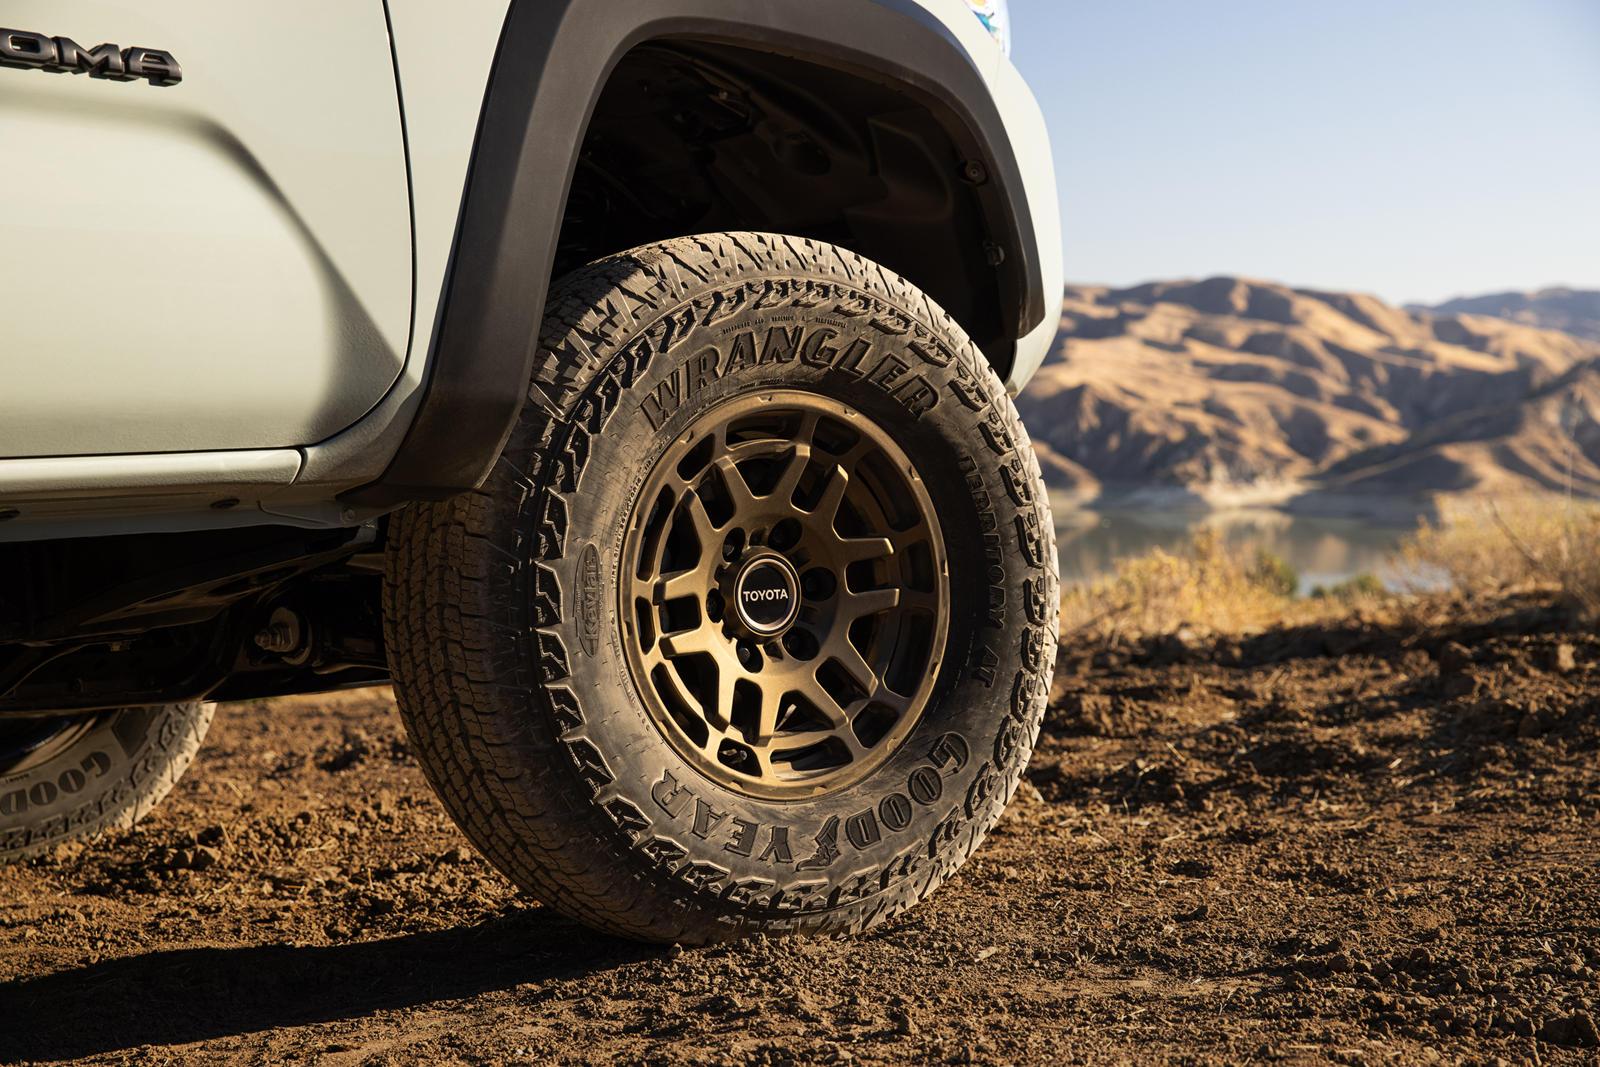 Toyota-Tacoma-Trail-Edition-bán-tải-off-road-giá-rẻ (3).jpg